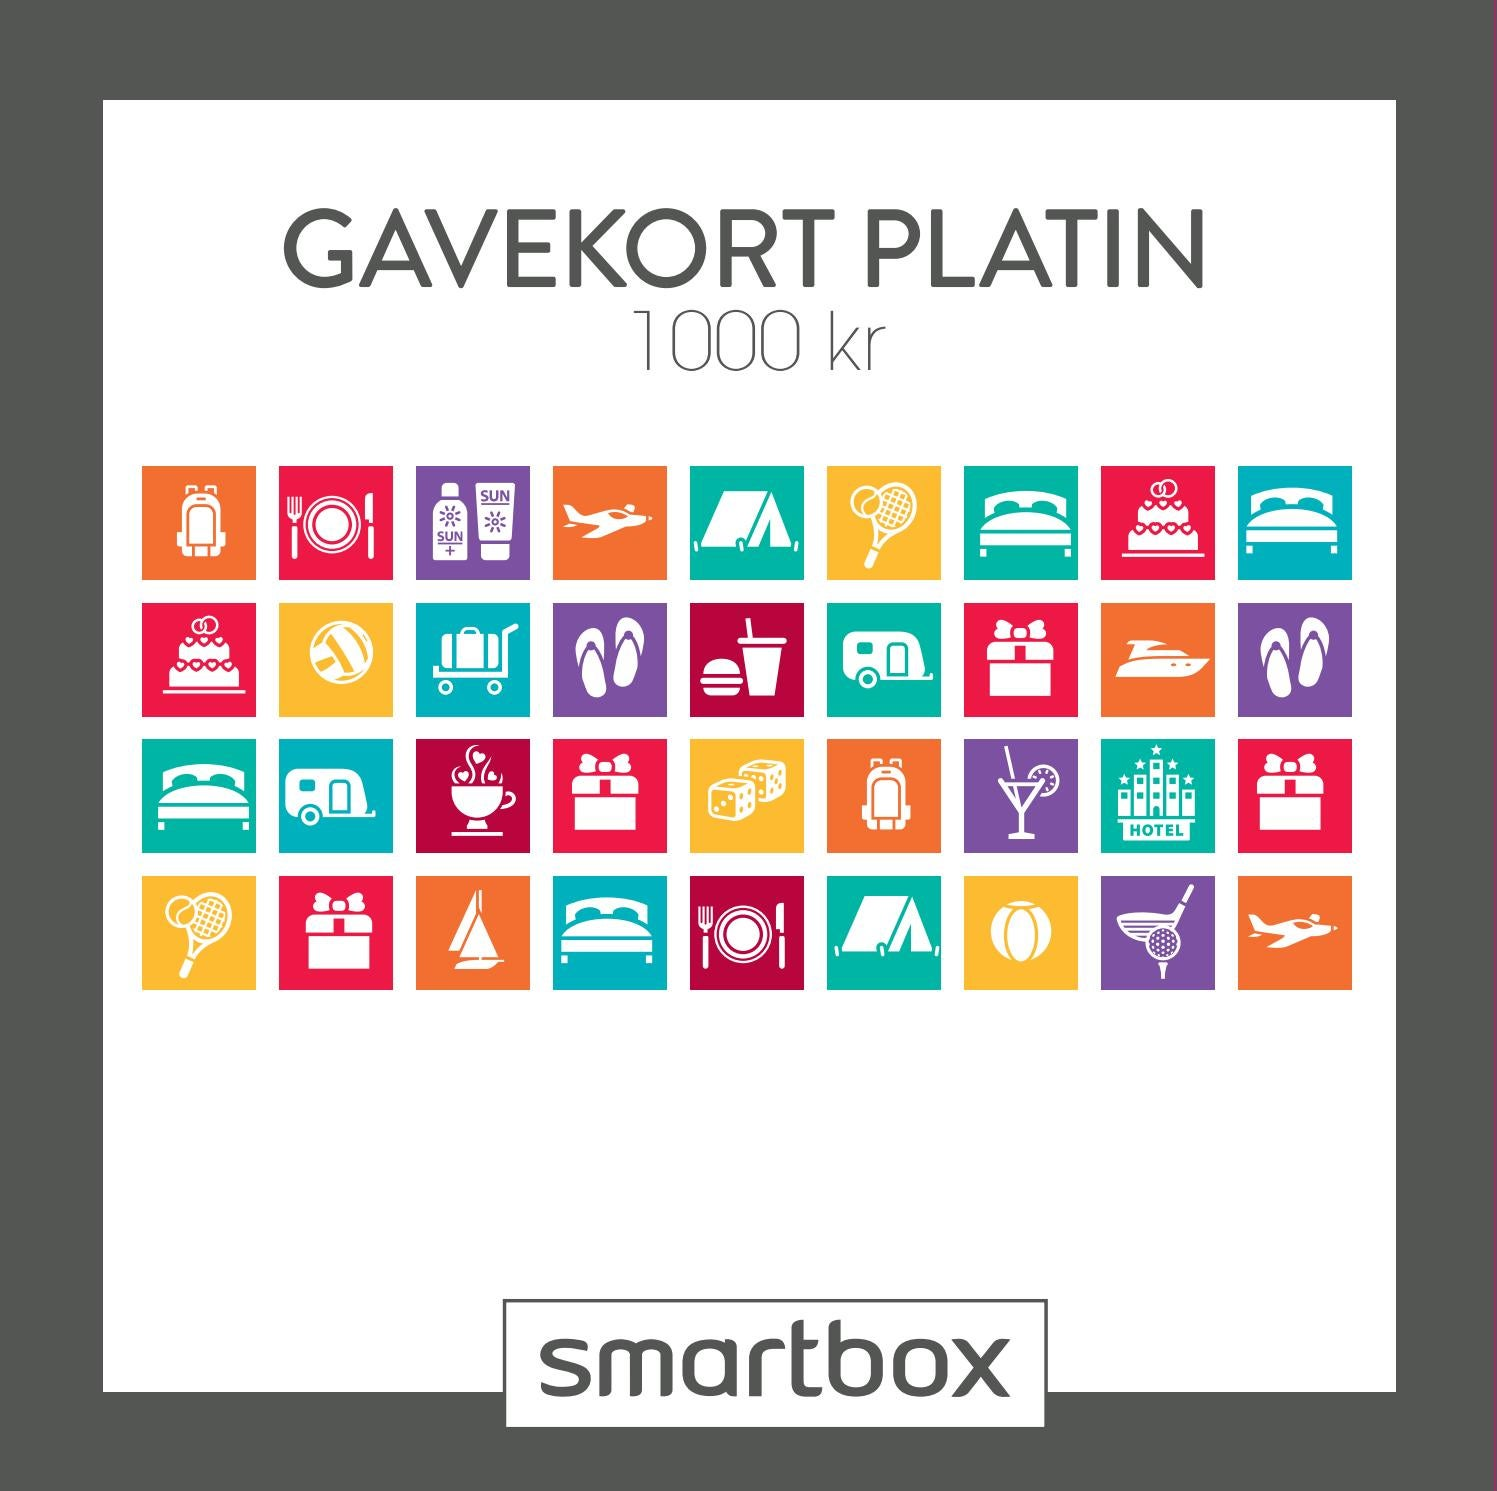 smartbox gavekort guld